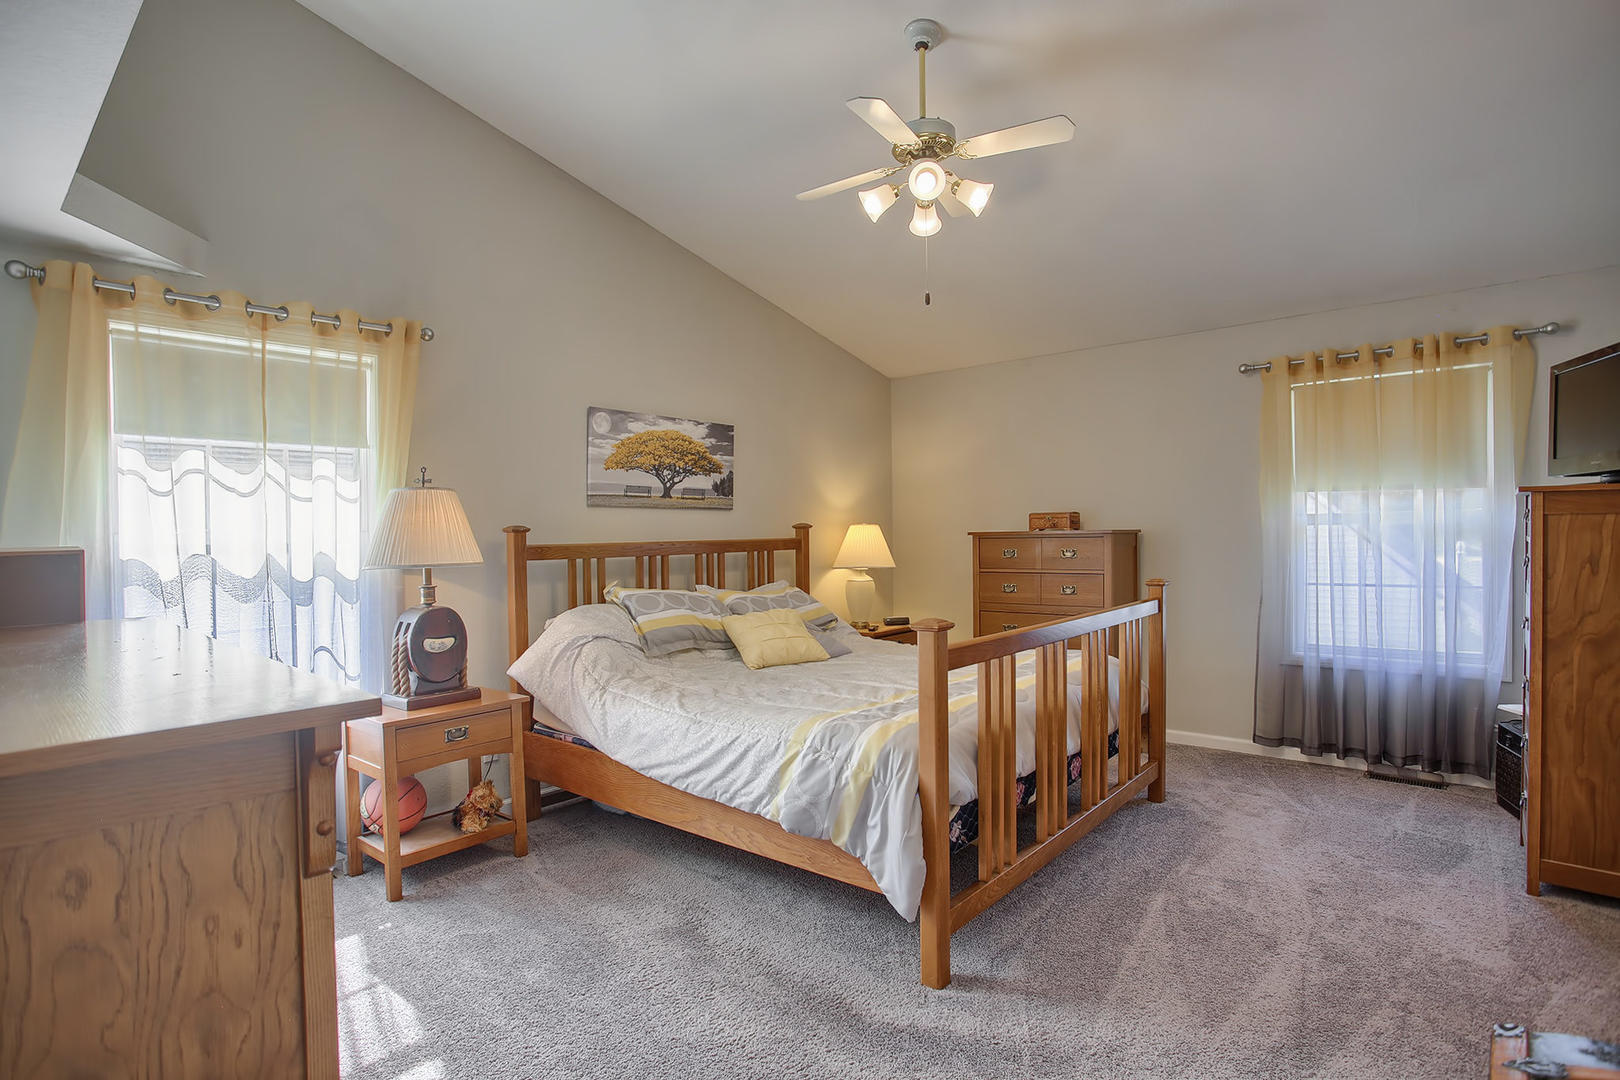 403 Laurel, St. Joseph, Illinois, 61873